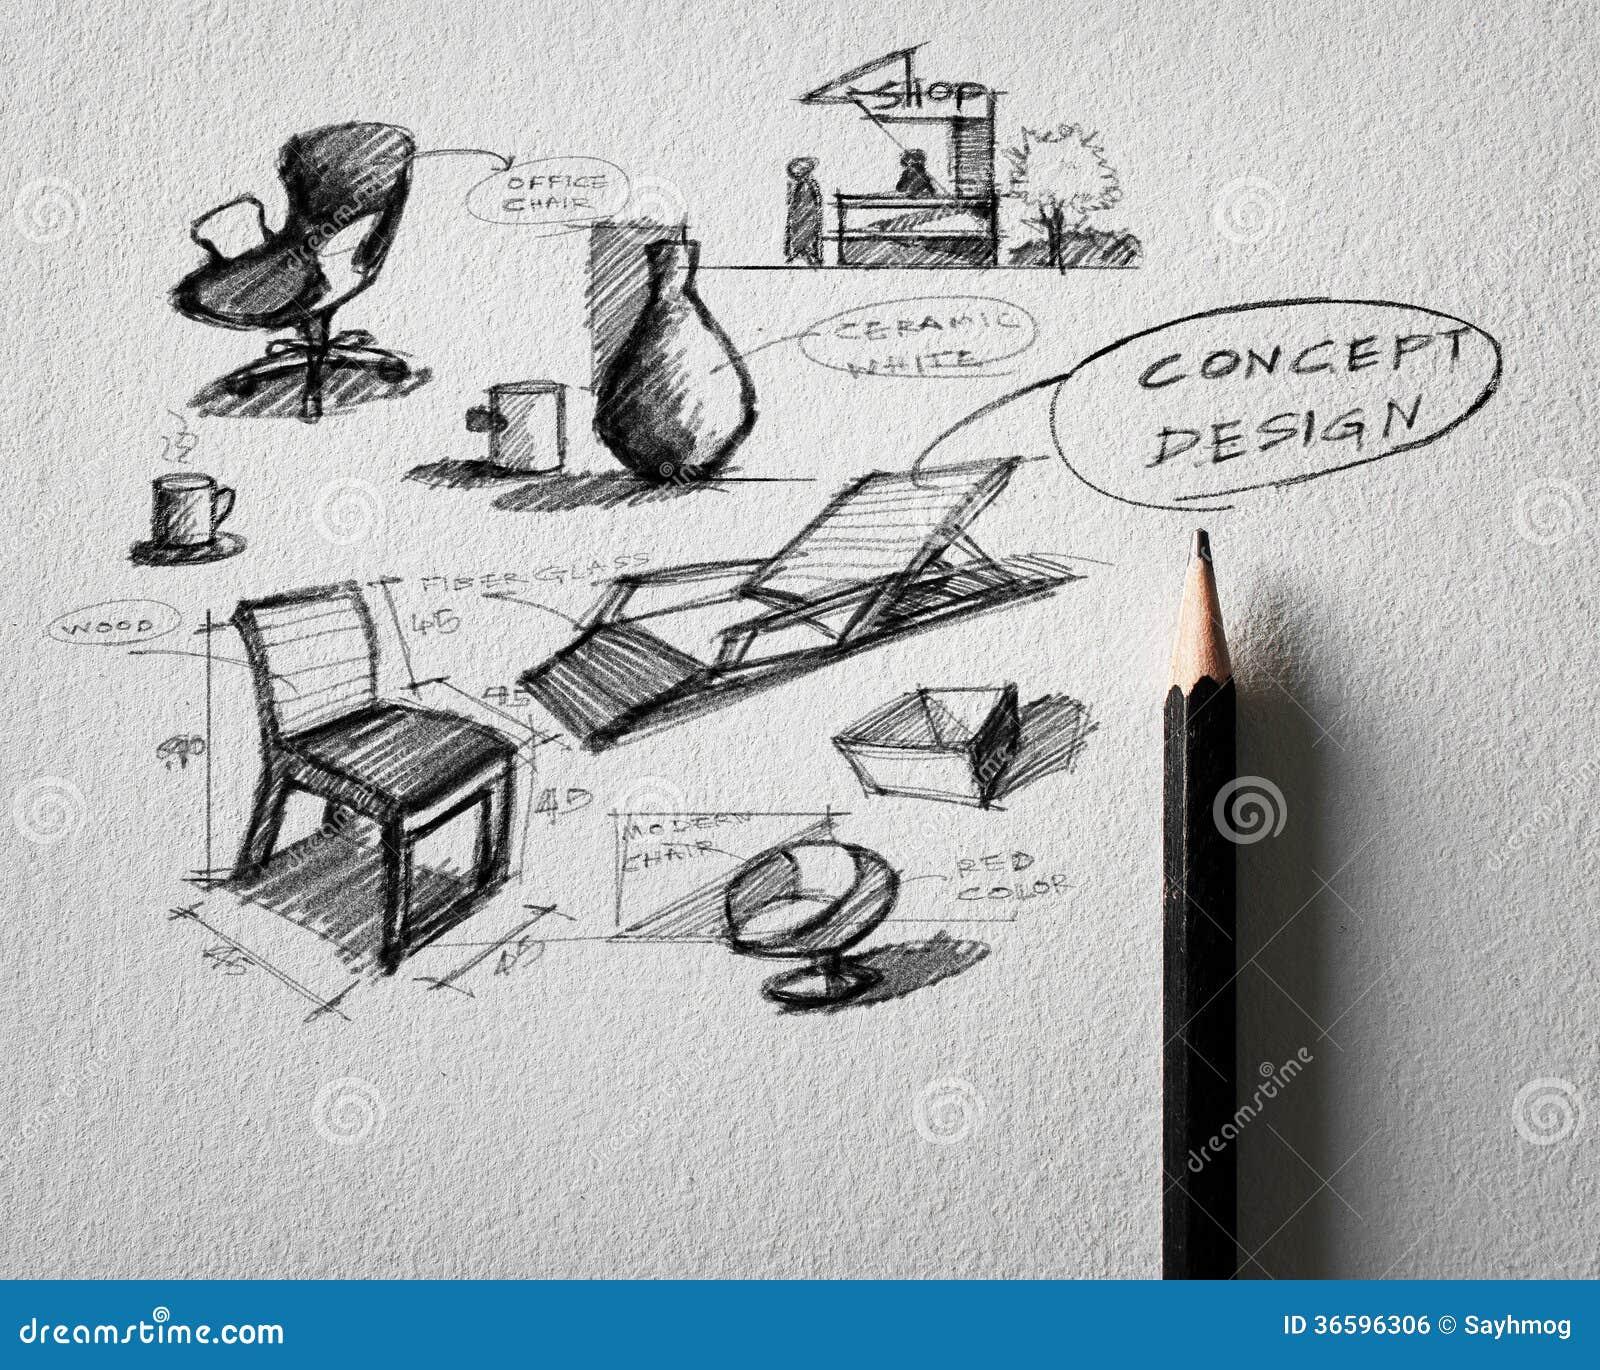 Concept Design Furniture. Furniture Concept Design Sketching On White Paper  Royalty Free